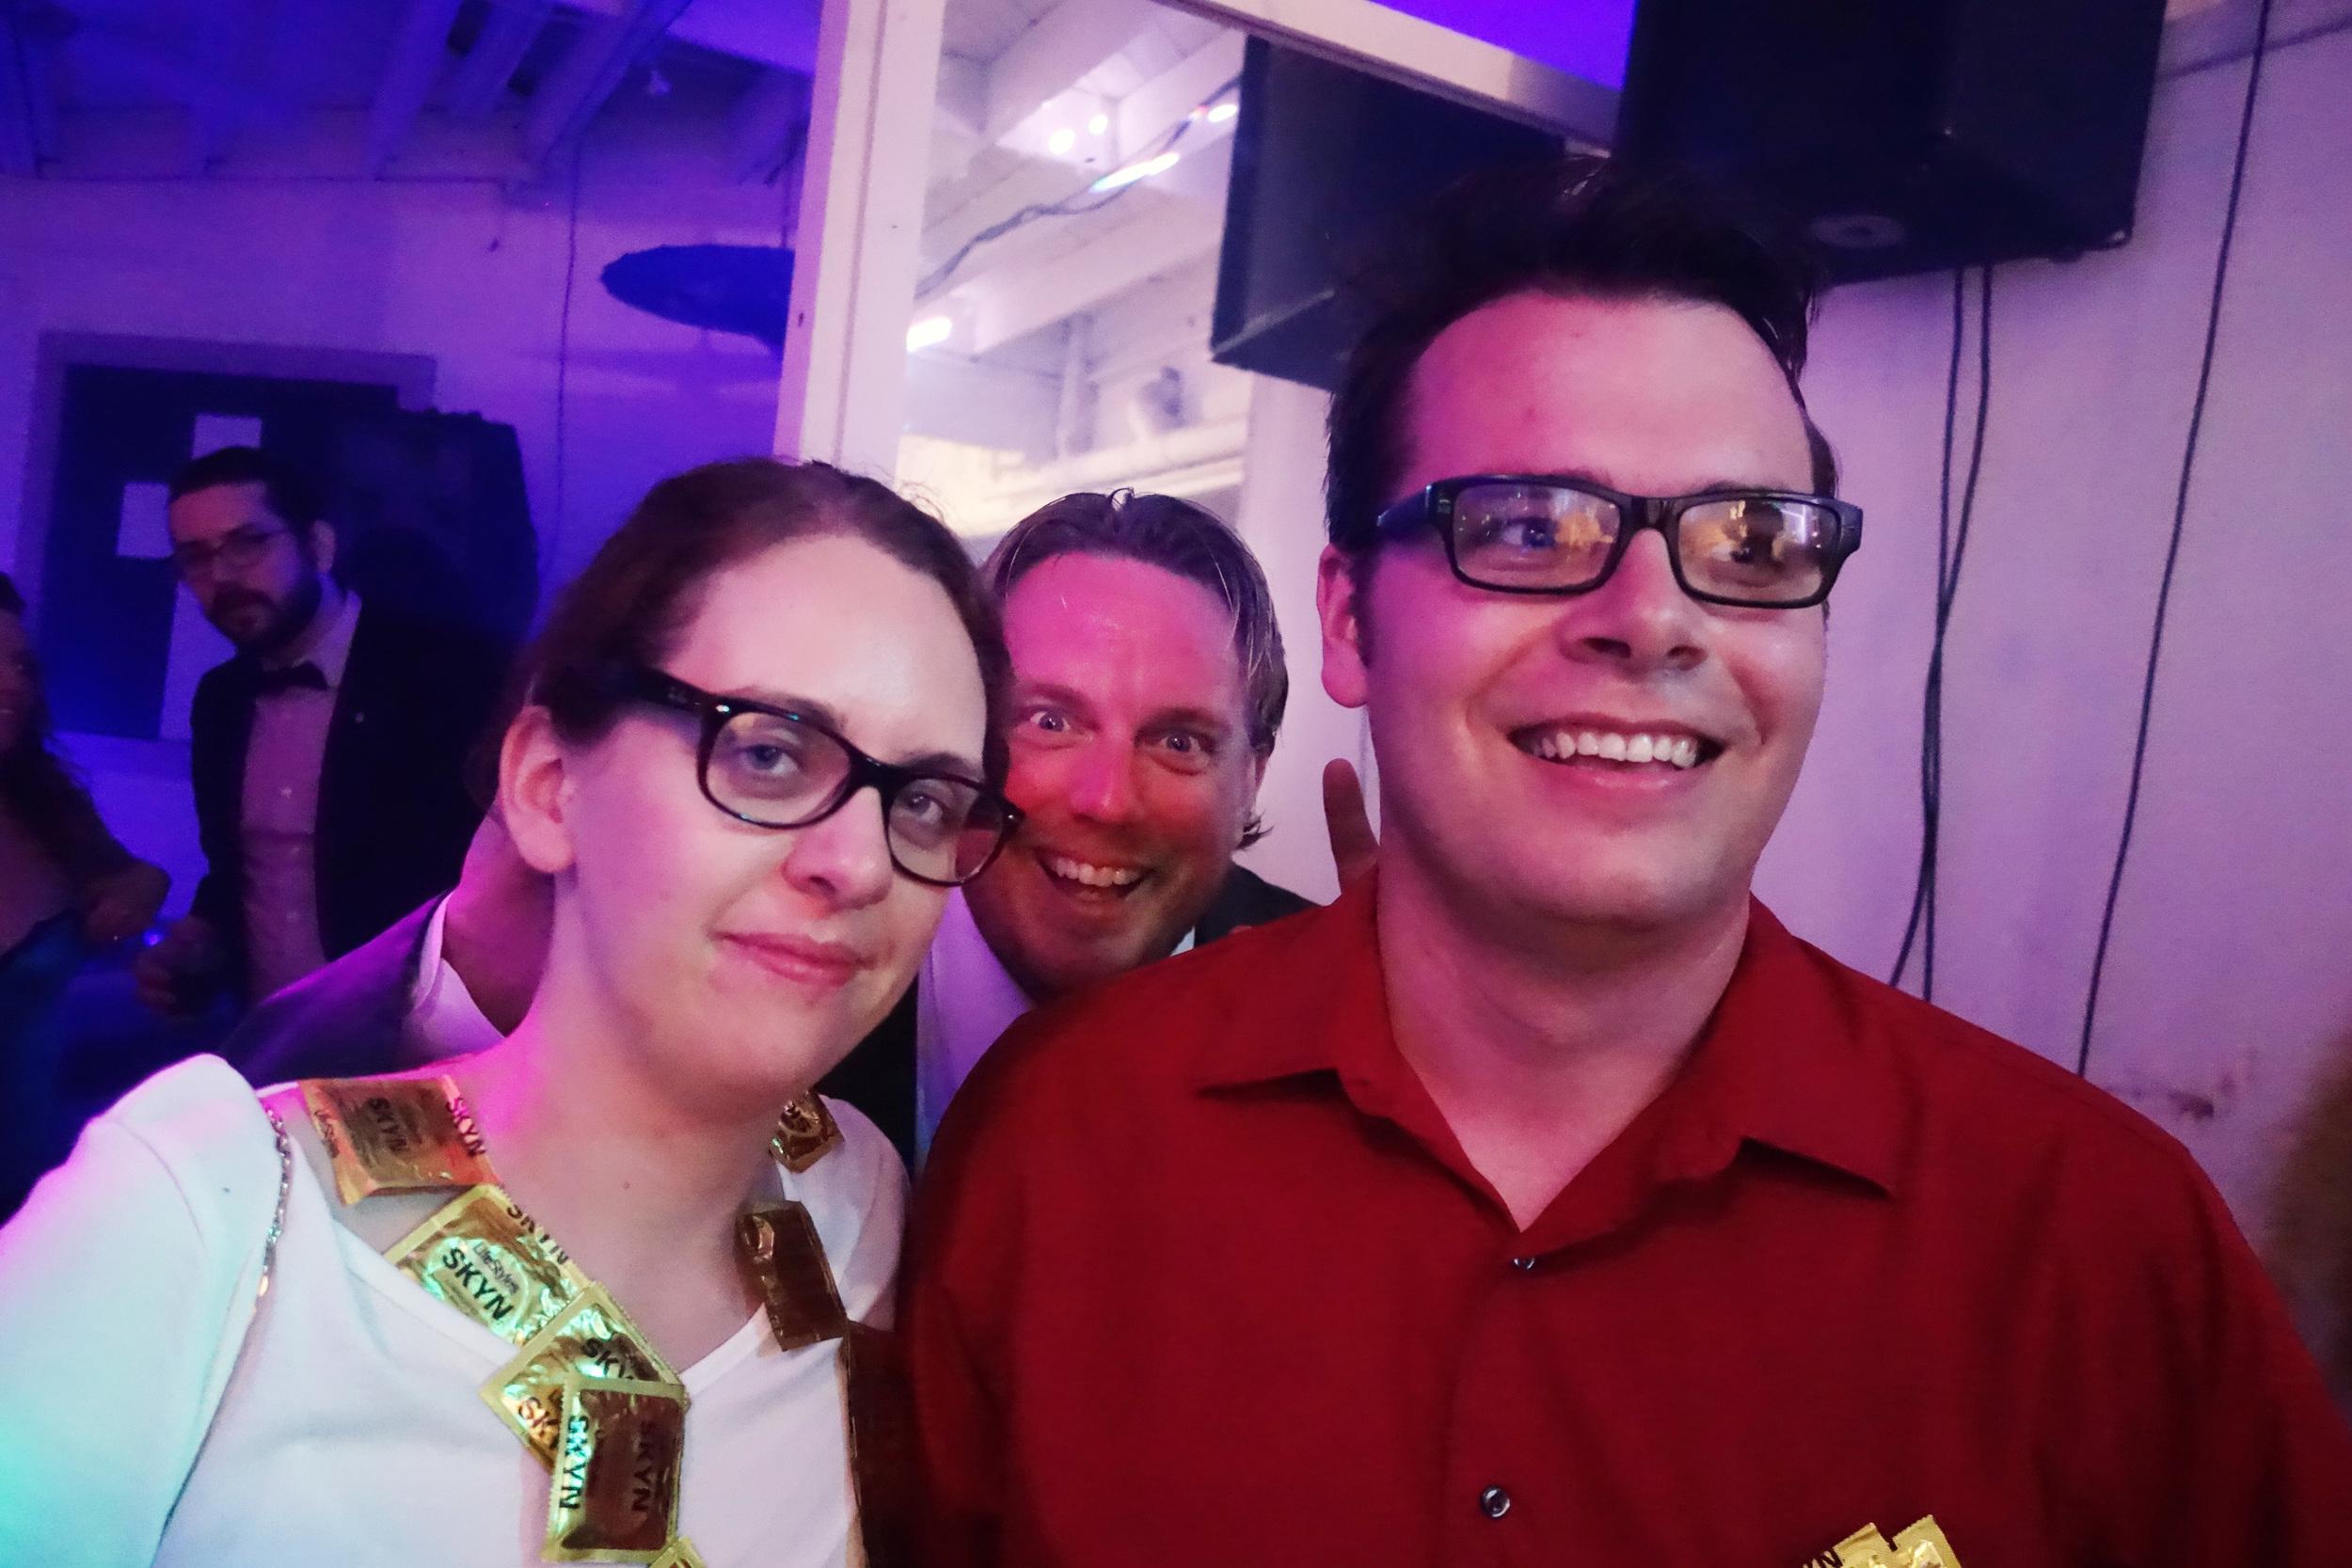 DSC03104 Erica, Jacob, and Brent.JPG